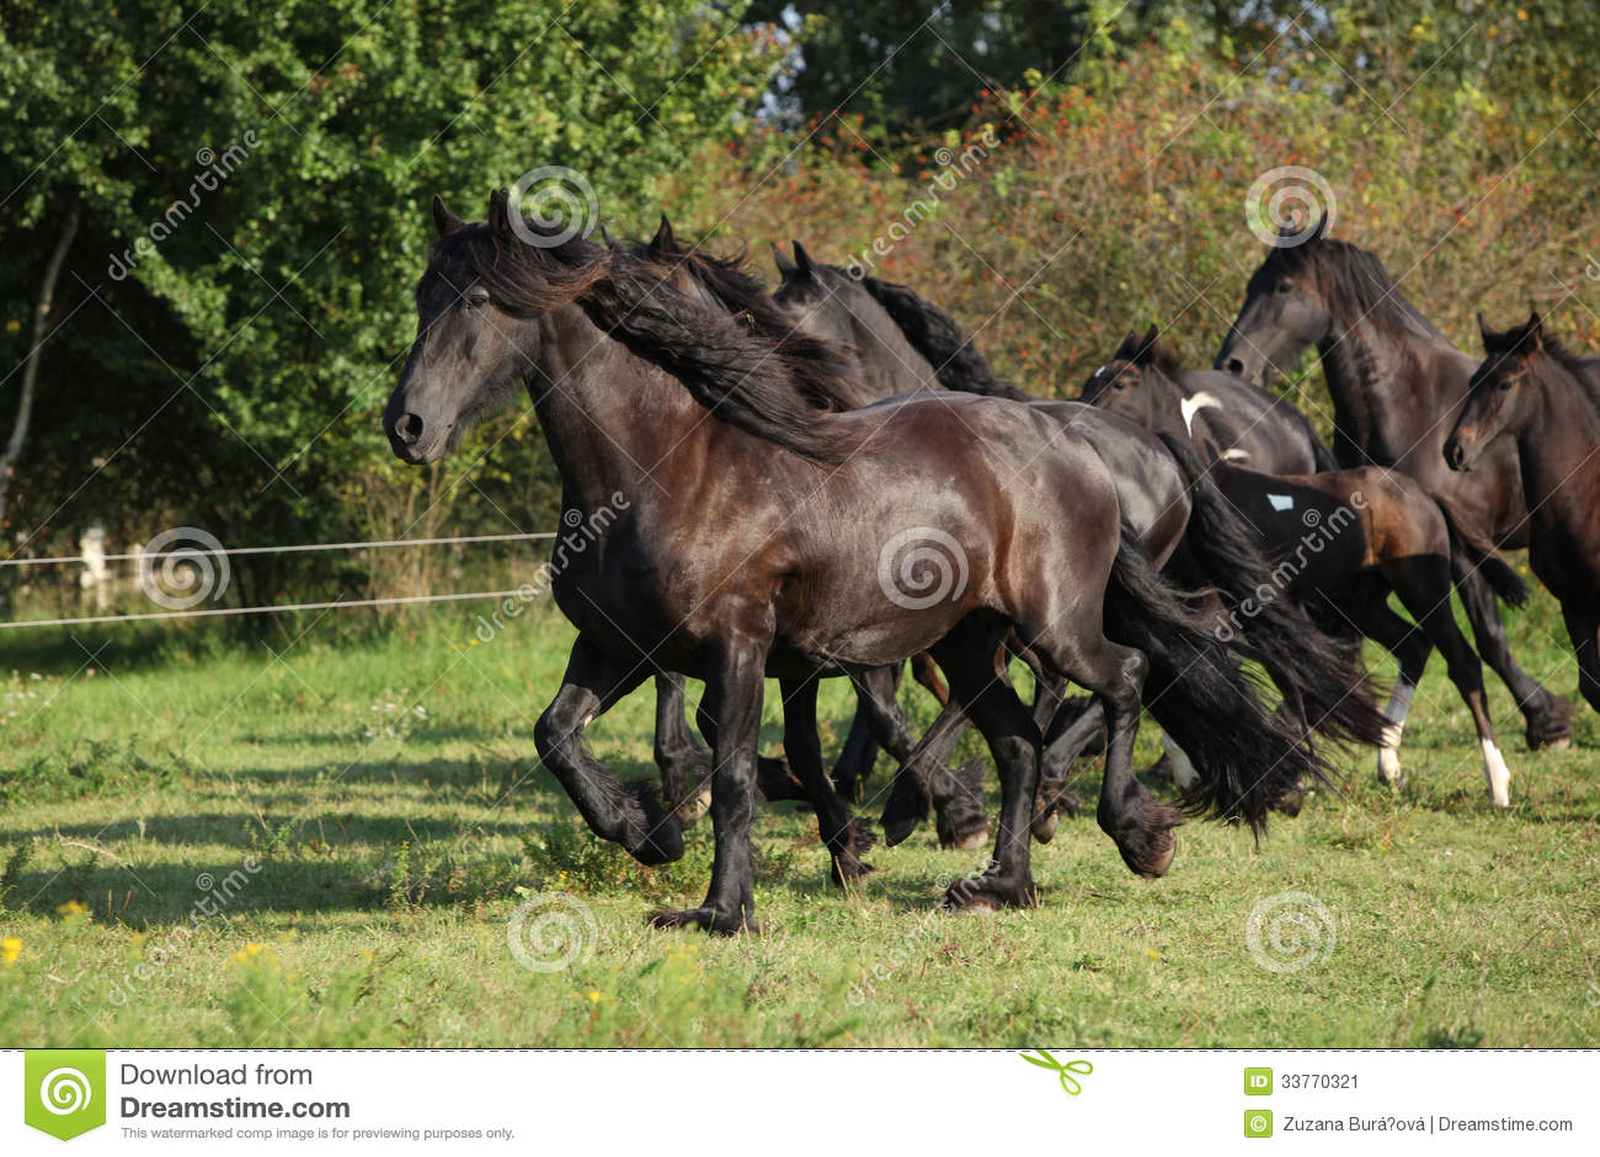 Black Horses And Friesian White